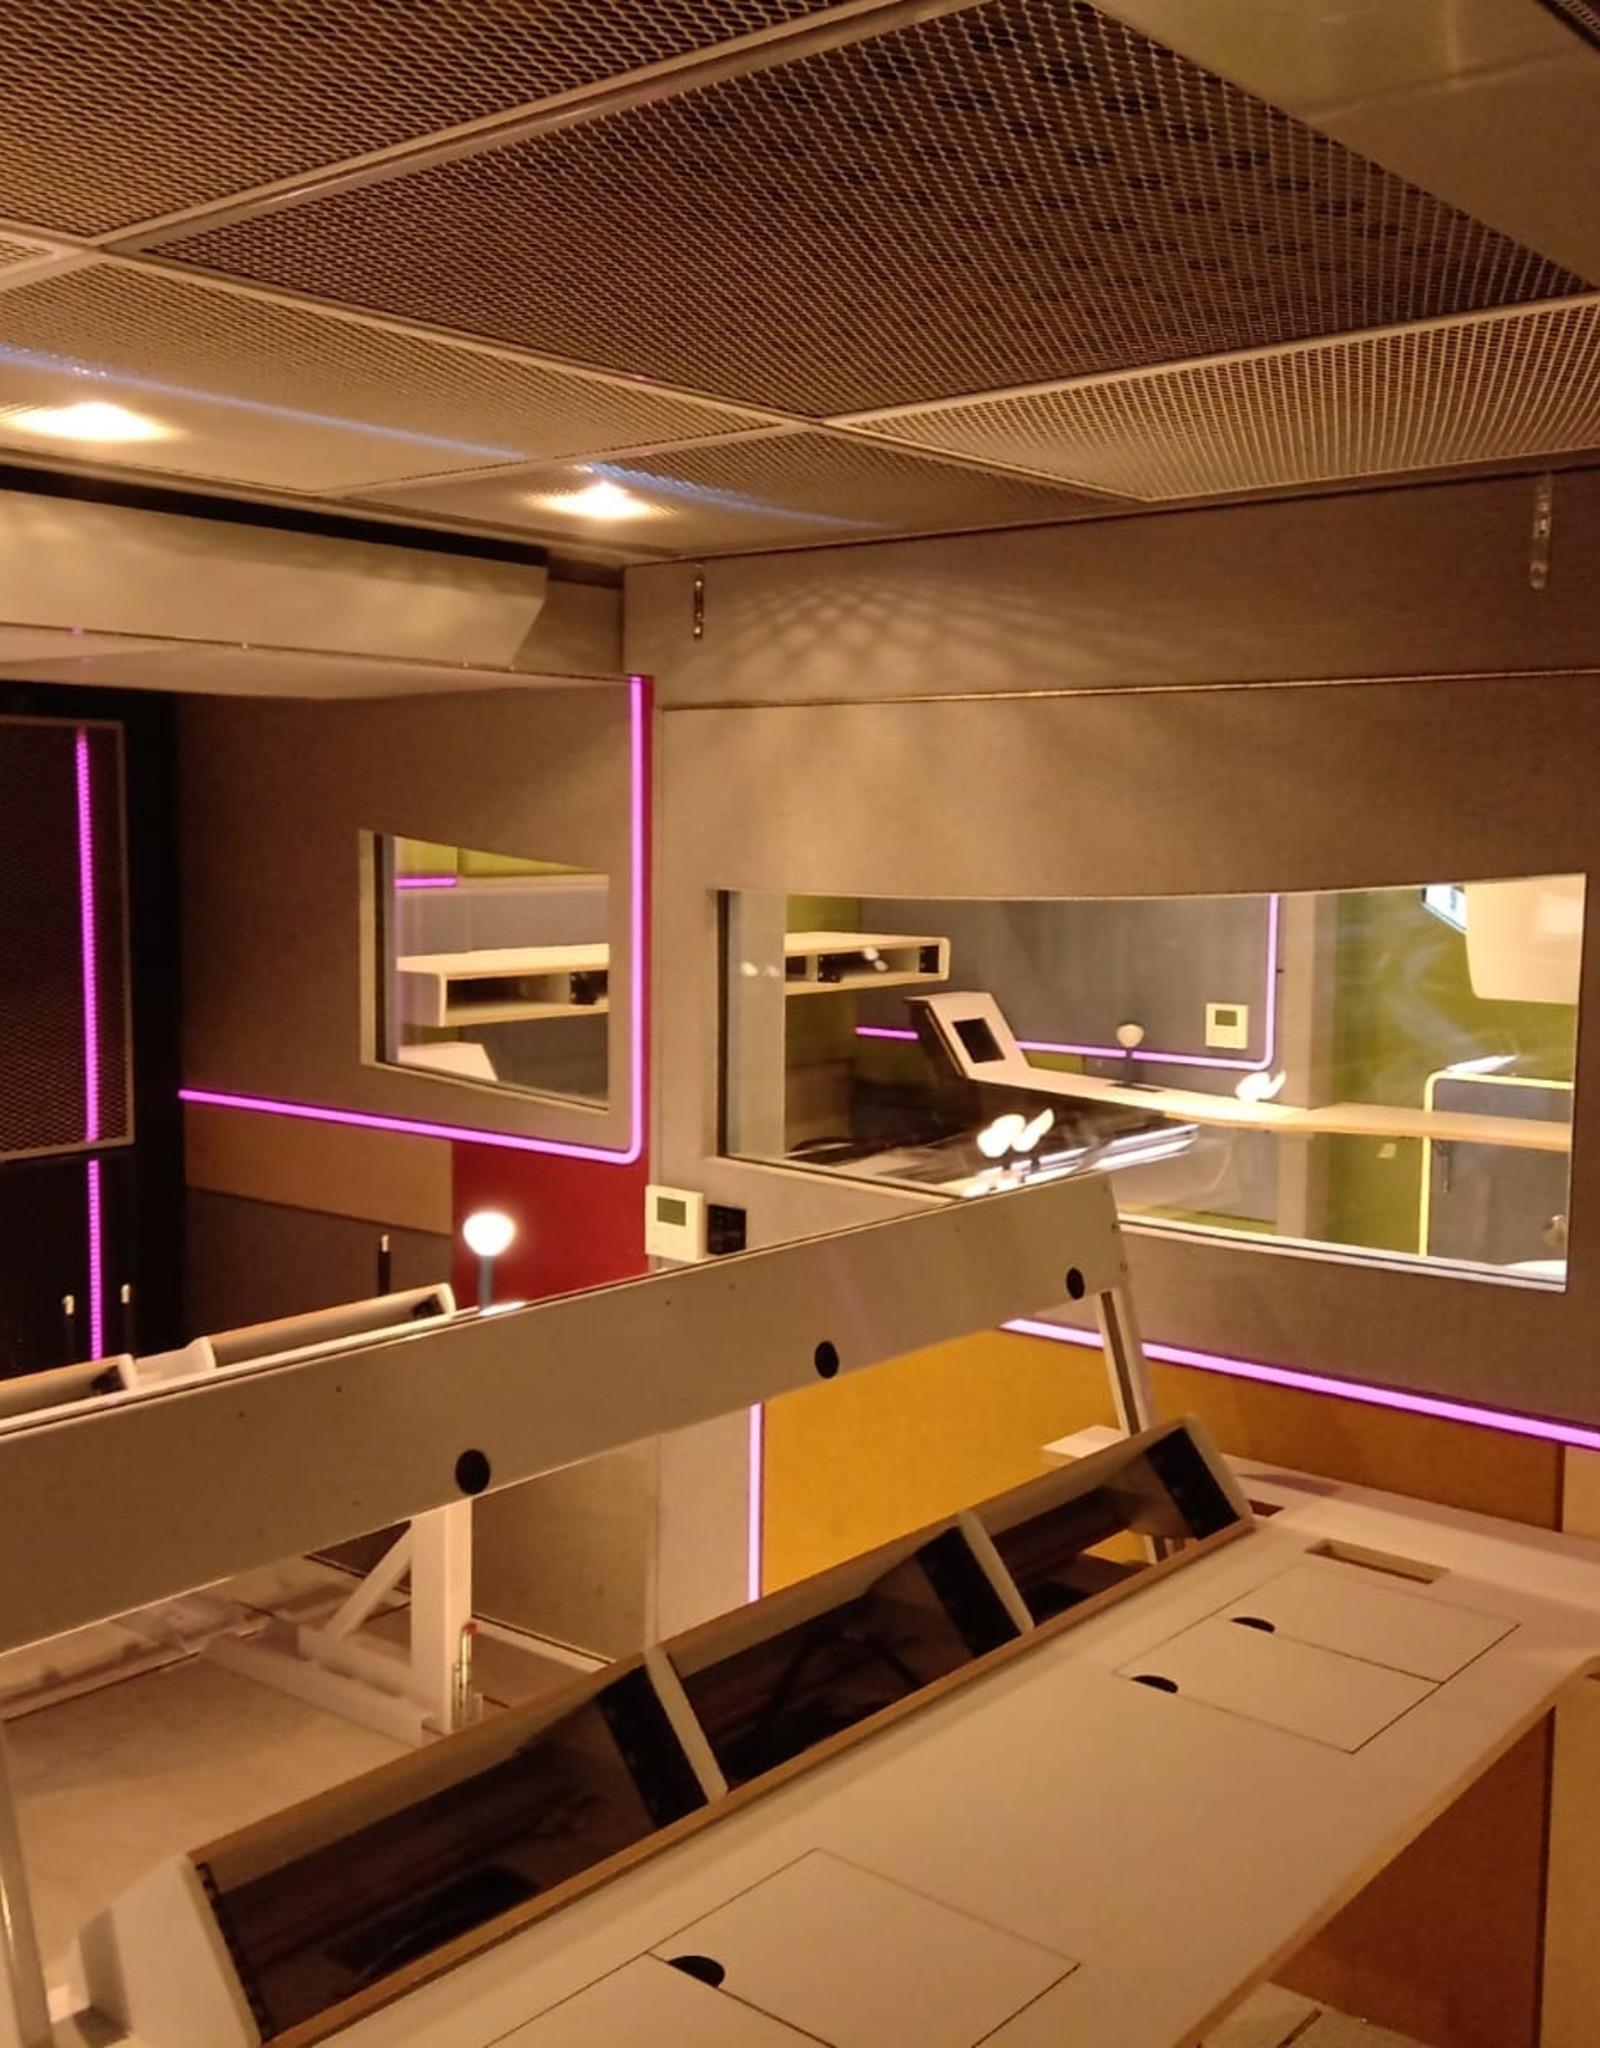 LedLed Neon flex led strip | 5m | RGB | 24V | 12W/m | 12x24mm | IP68